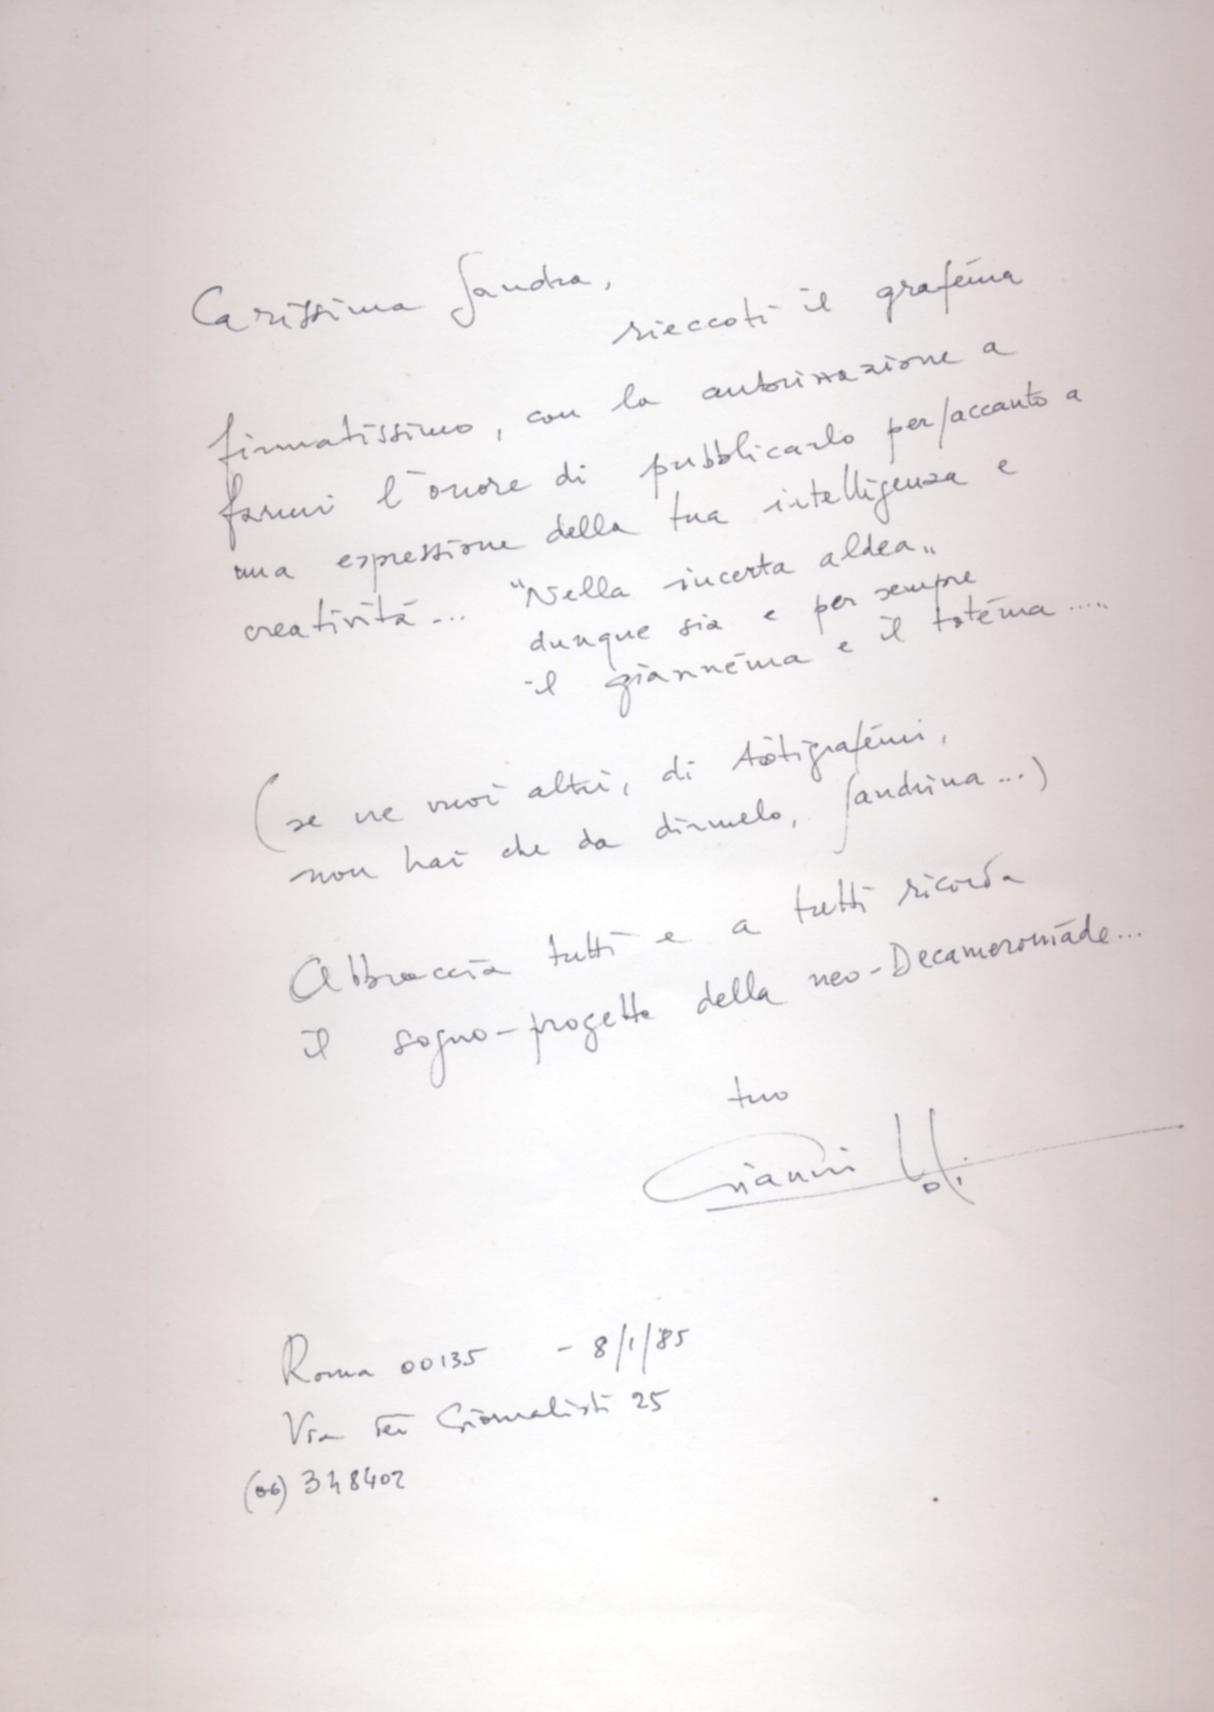 Testo autografo di Gianni Toti